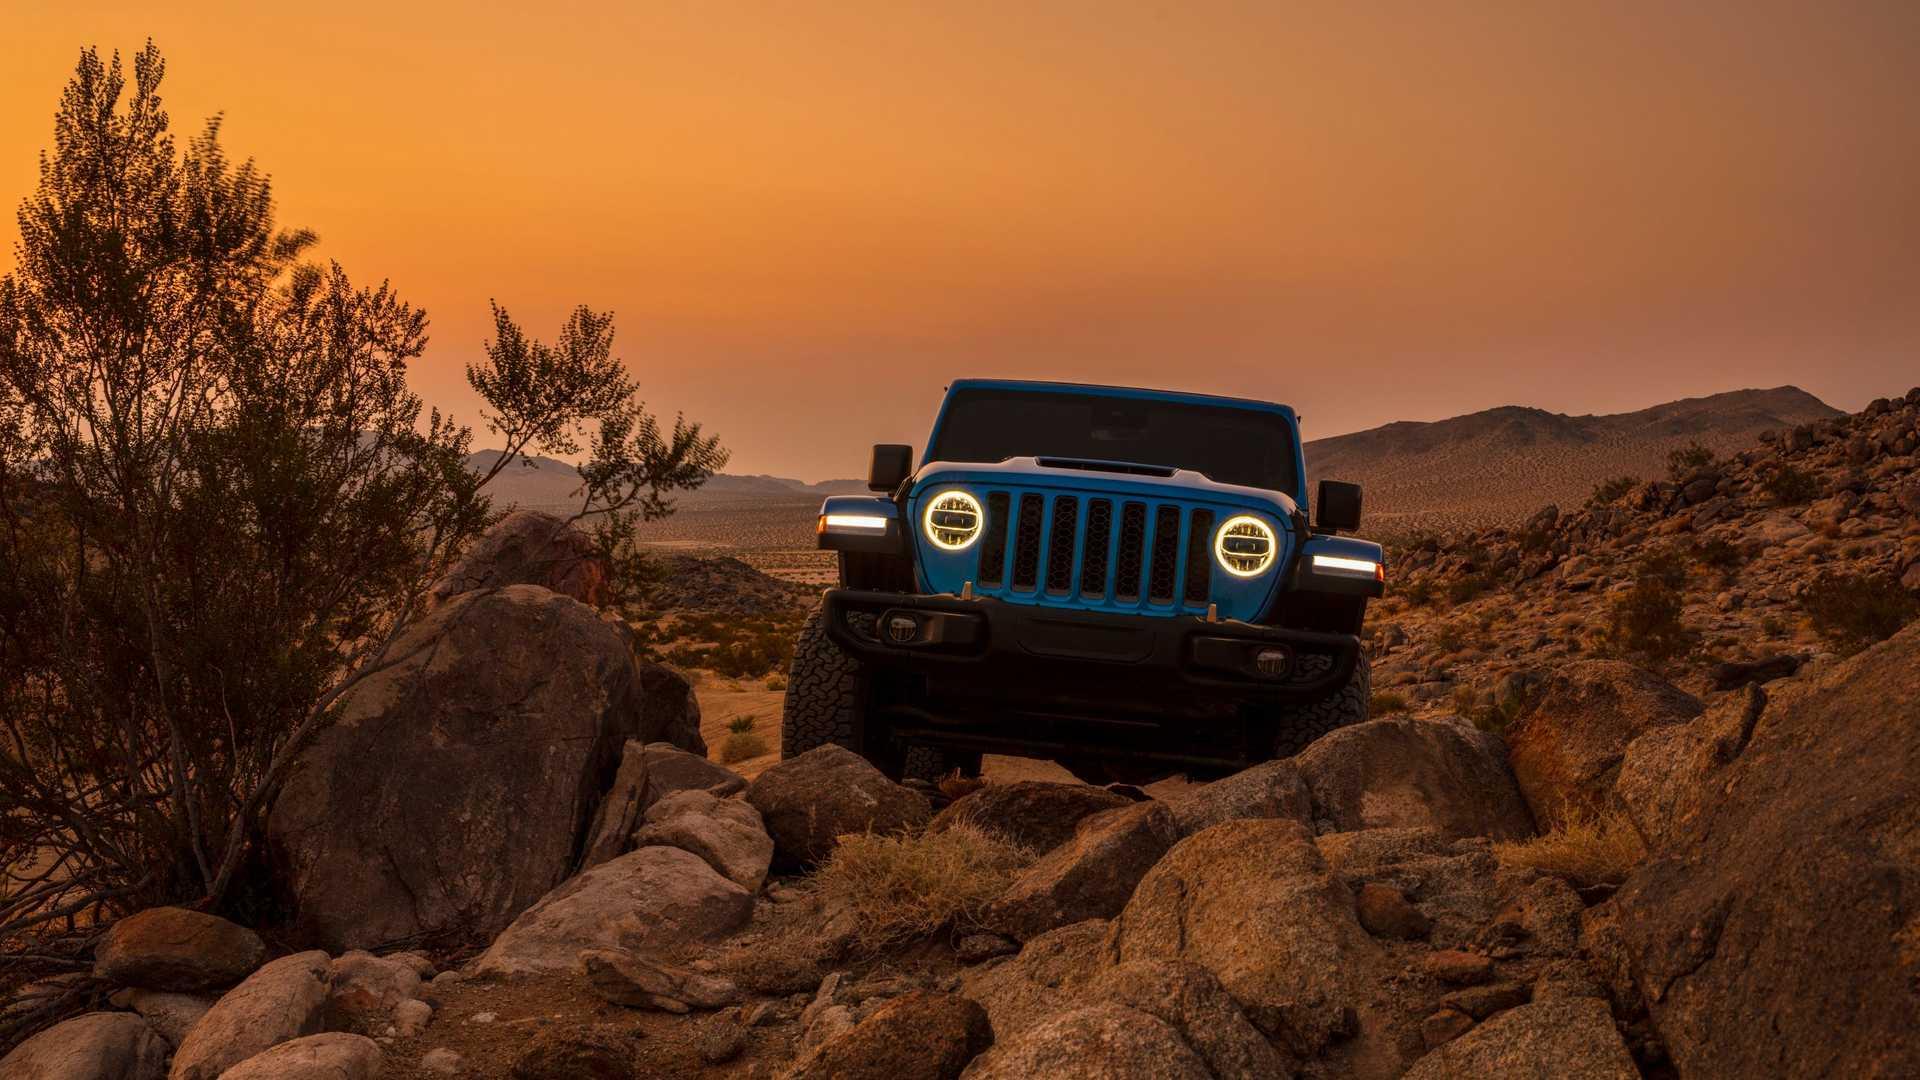 2021-jeep-wrangler-rubicon-392-front-view-7